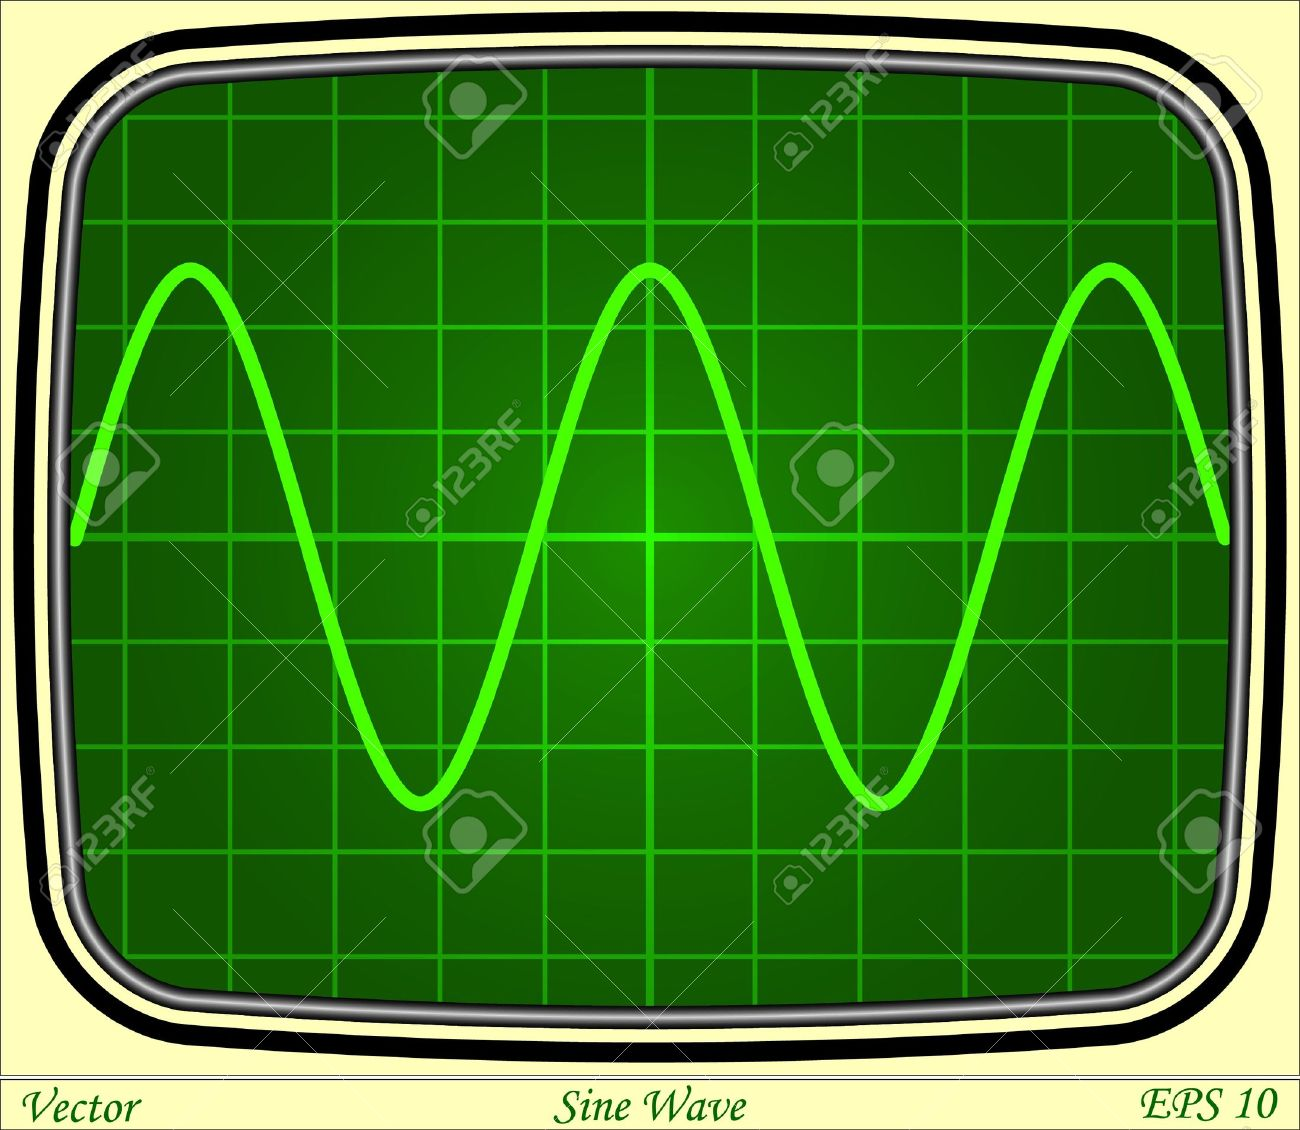 Oscilloscope Stock Photos Images. Royalty Free Oscilloscope Images ...